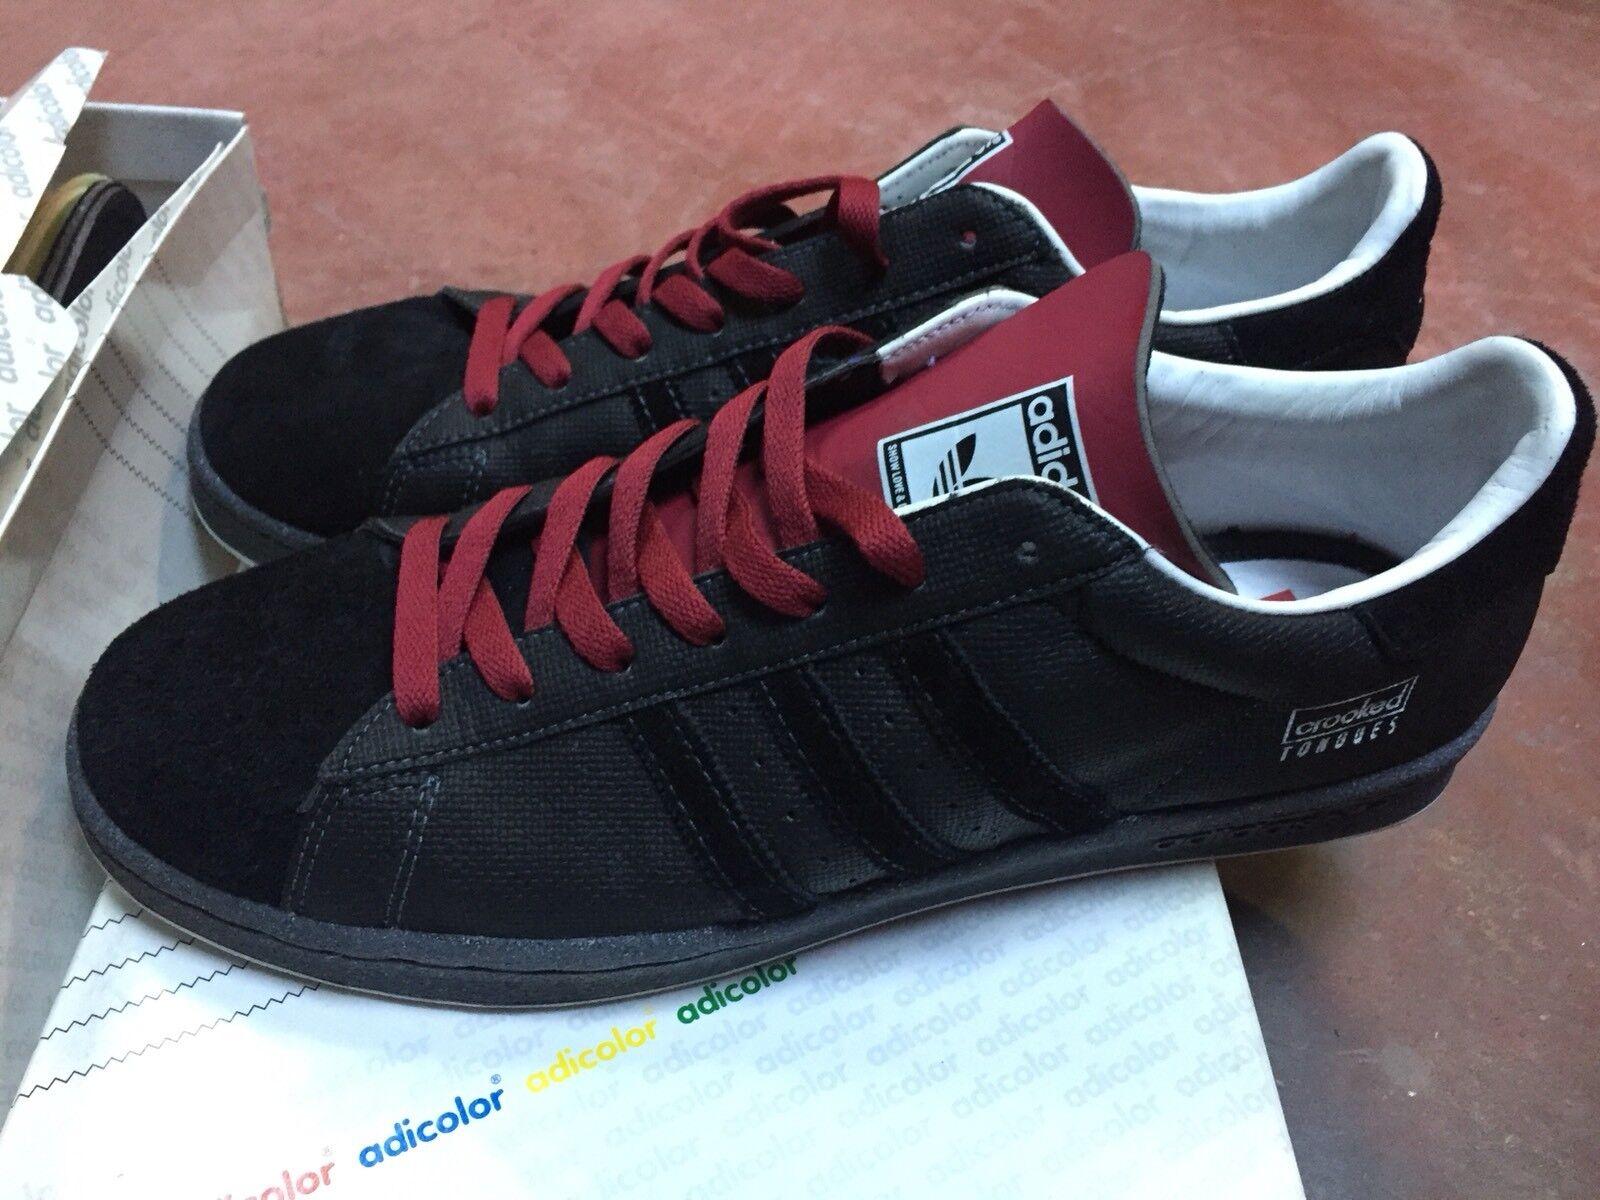 Adidas Century Low Black Adicolor 11,5 US 46 EU Crooked Tongues Tongues Crooked 972f1e